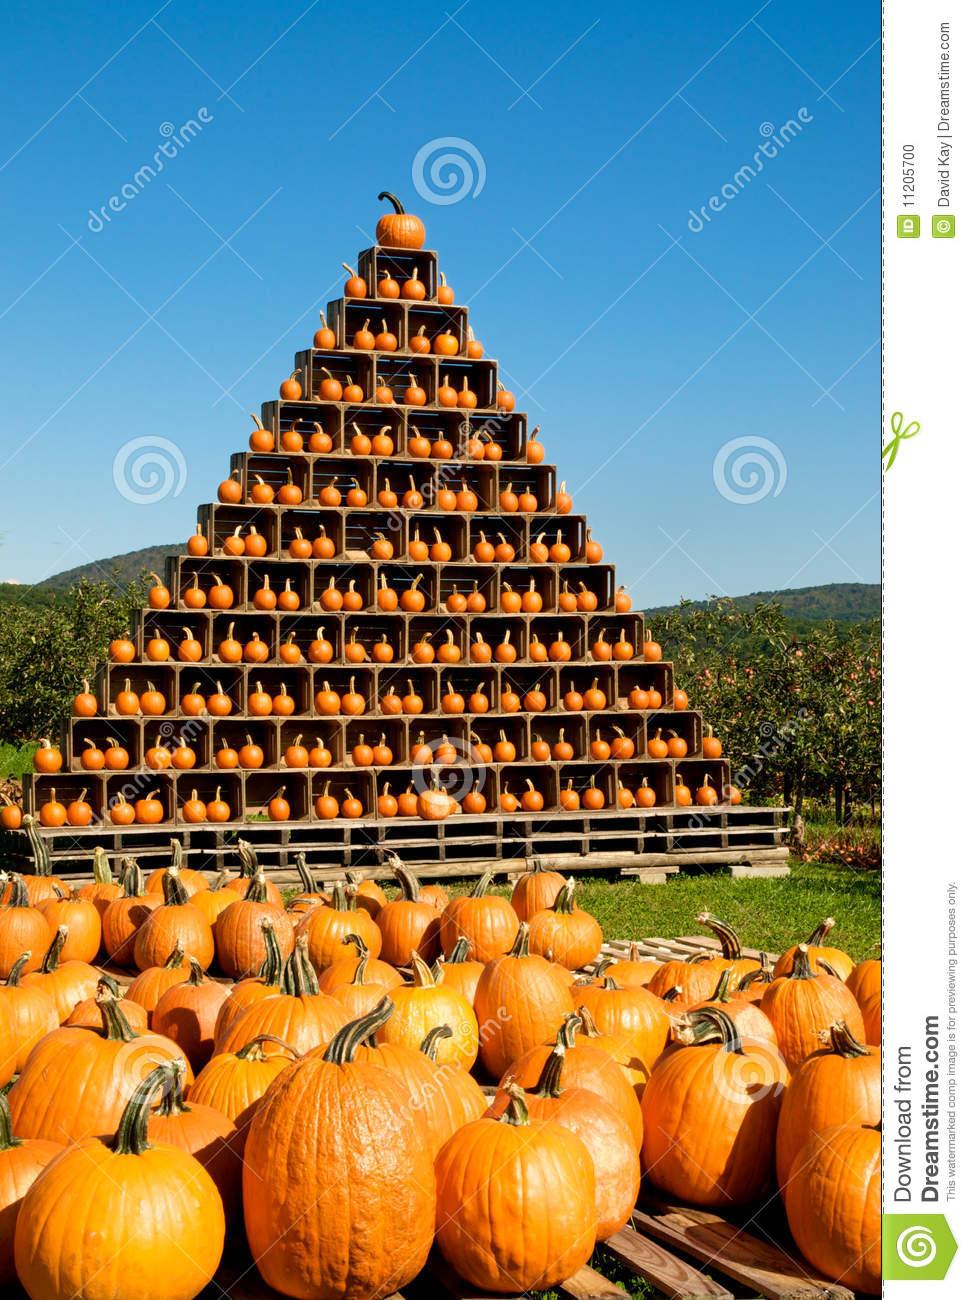 Pumpkin Pyramid Stock Photo.